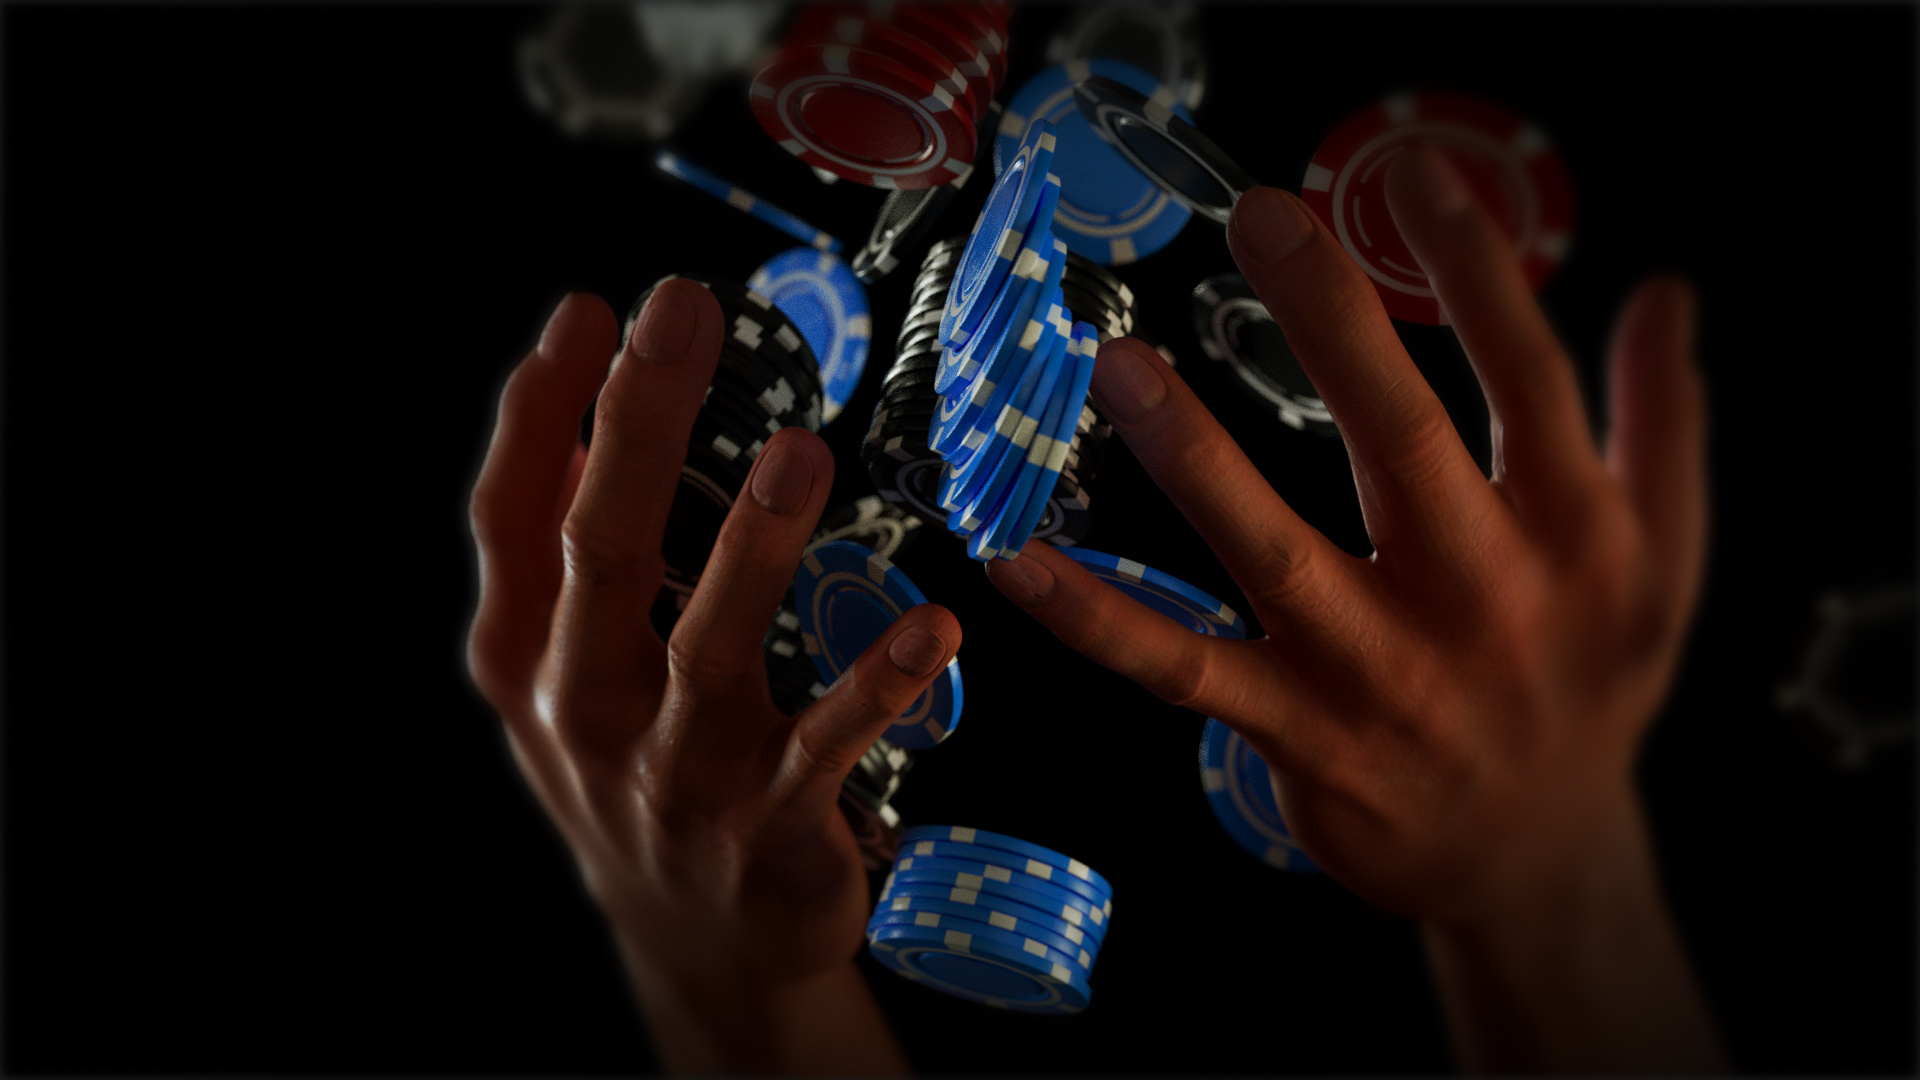 cash, casino, fruit, jackpot, las vegas, logo, machine, money, opener, reels, slot, slots, spinning, wheel, winner